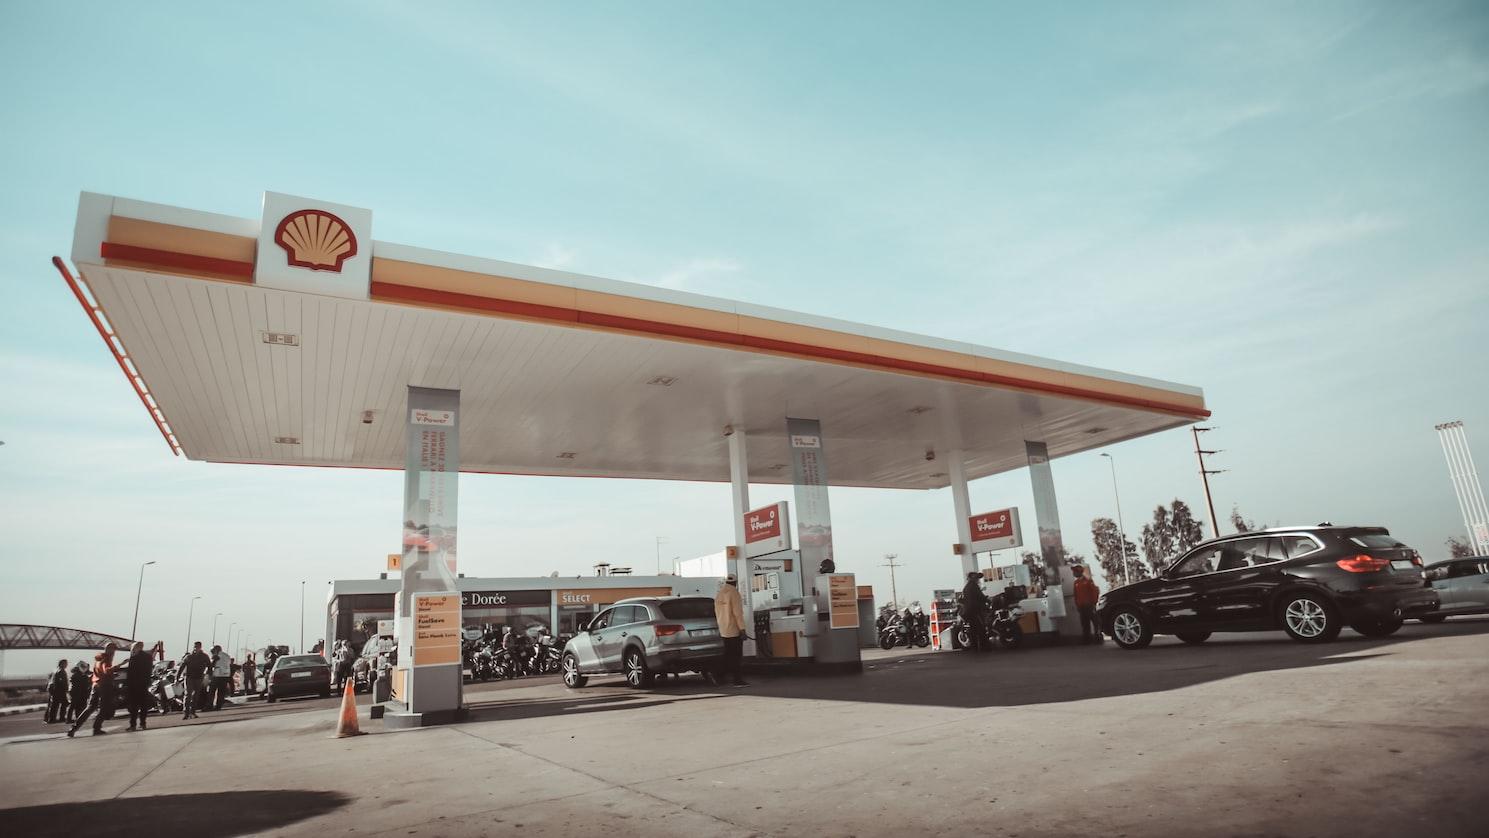 Gasoline Stand Japanese English